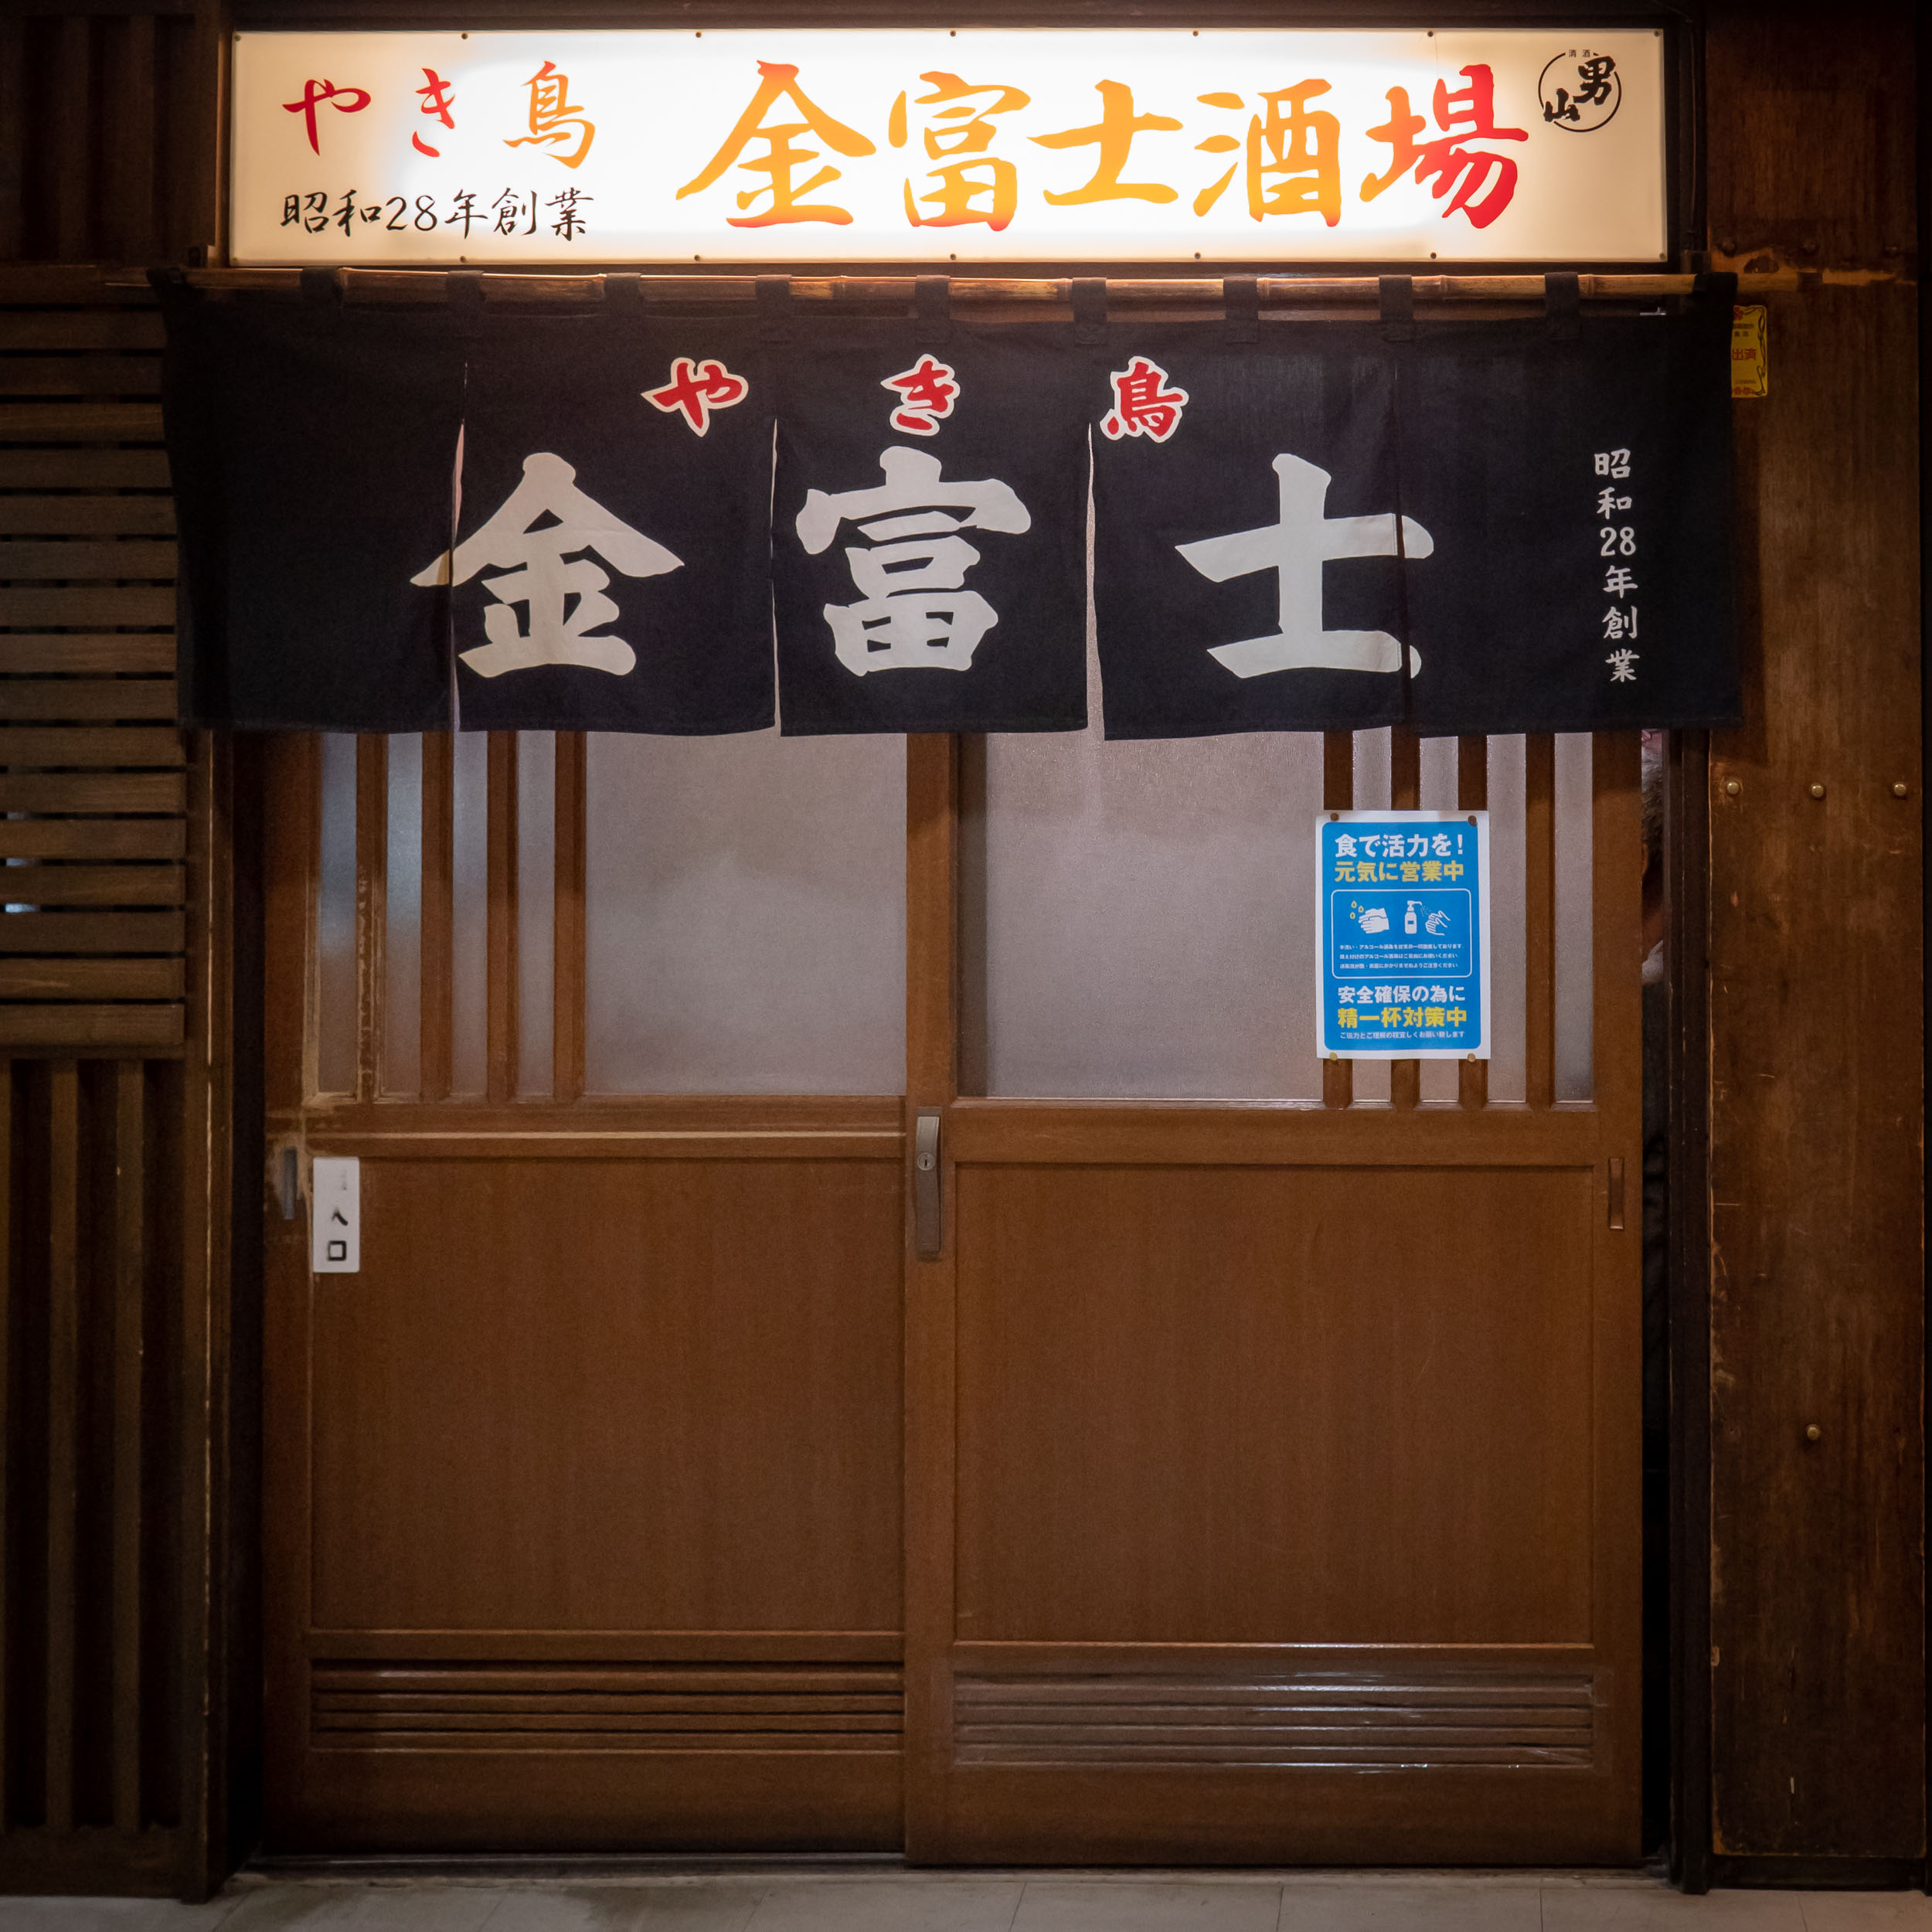 札幌市中央区南5条西3丁目地下「やき鳥 金富士」の門構え DMC-GX8 + LEICA DG 12-60mm